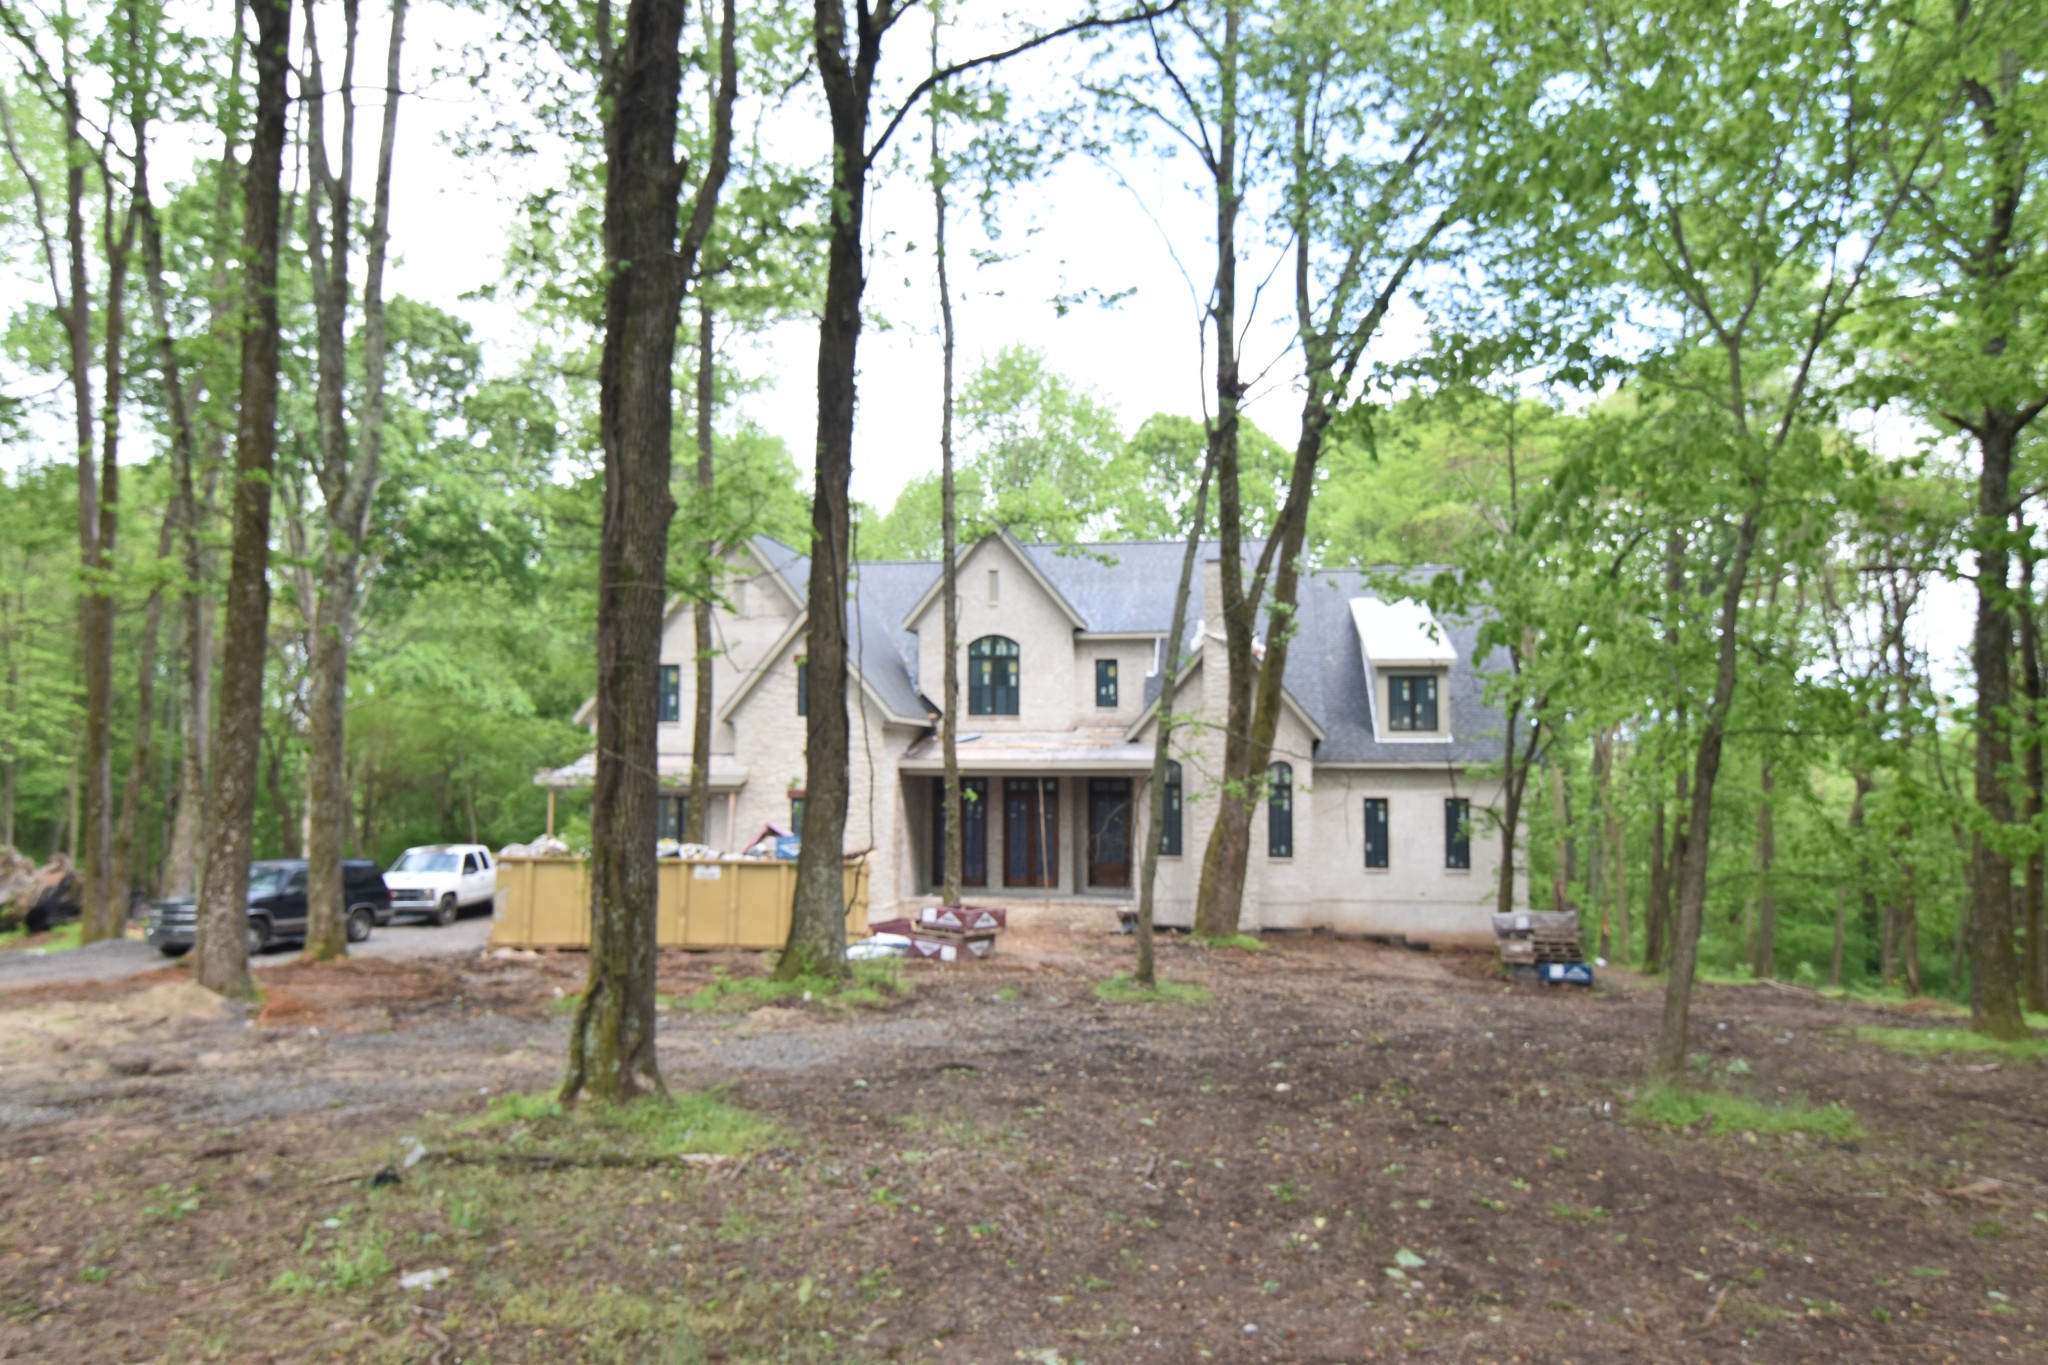 5014 Hilltop Ln, Lot 6, College Grove, TN 37046 - College Grove, TN real estate listing